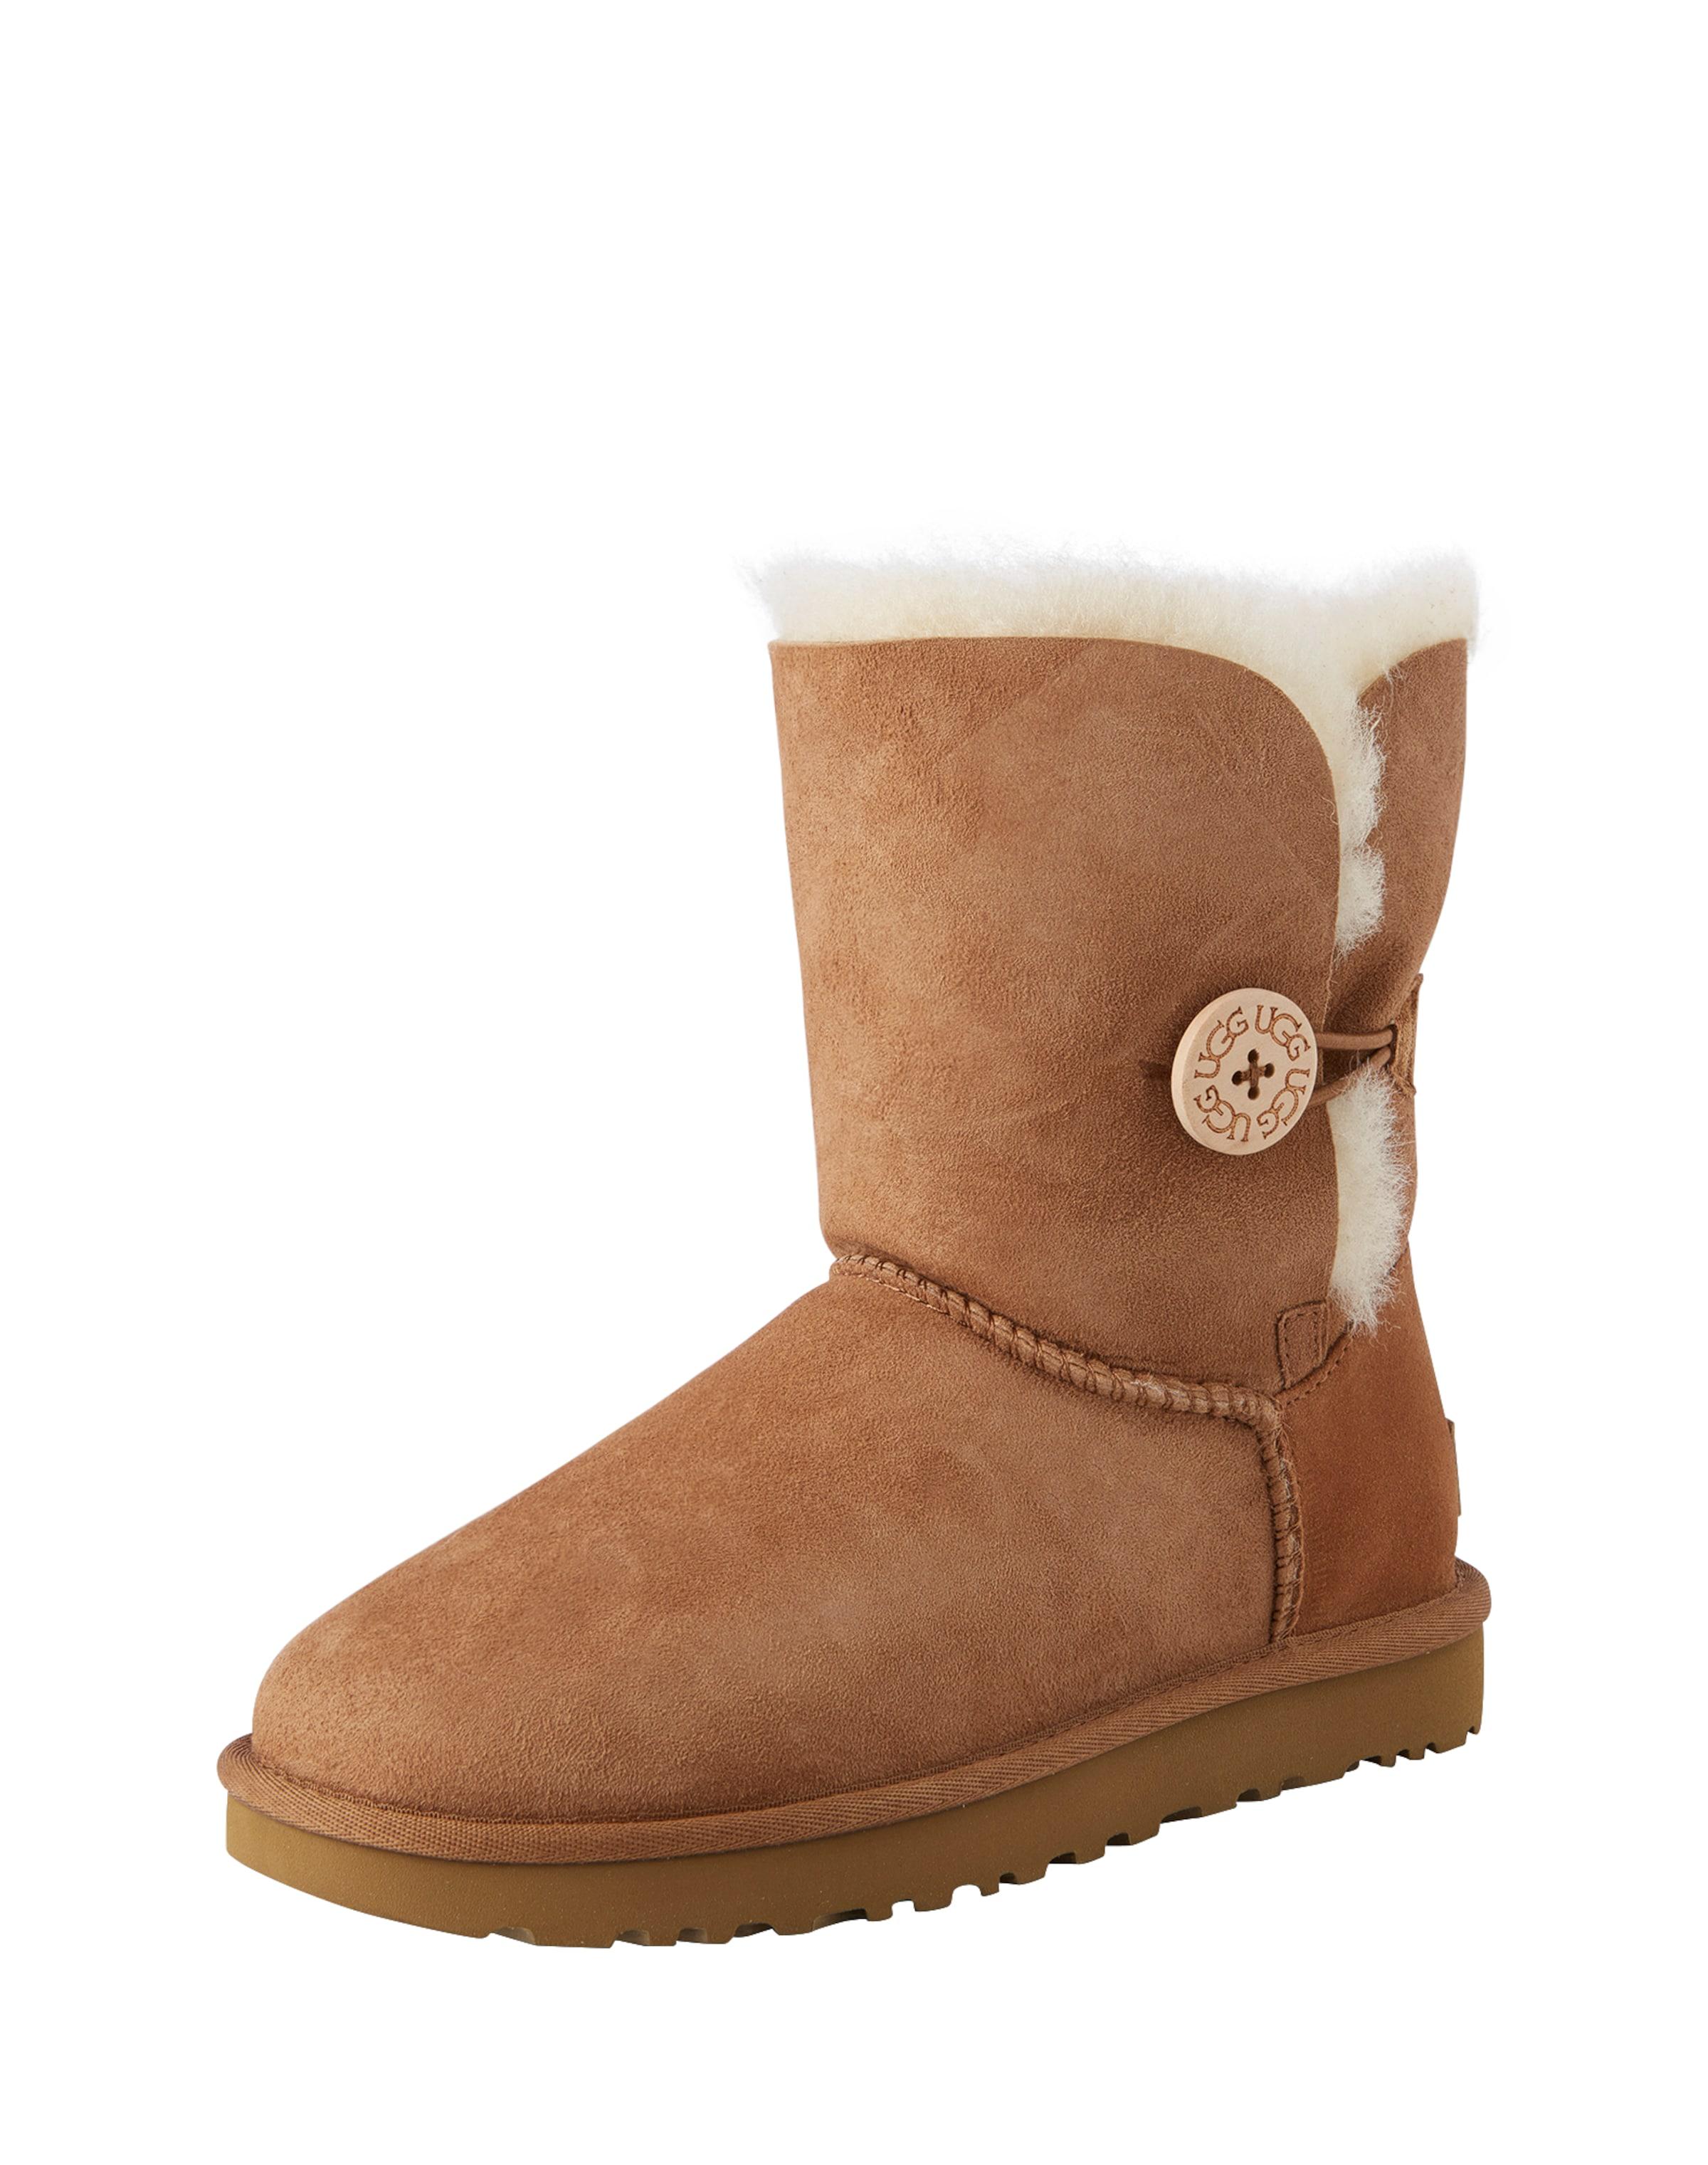 Ugg Bouton De Bailey Ii 'snowboots Cognac CbFNMv